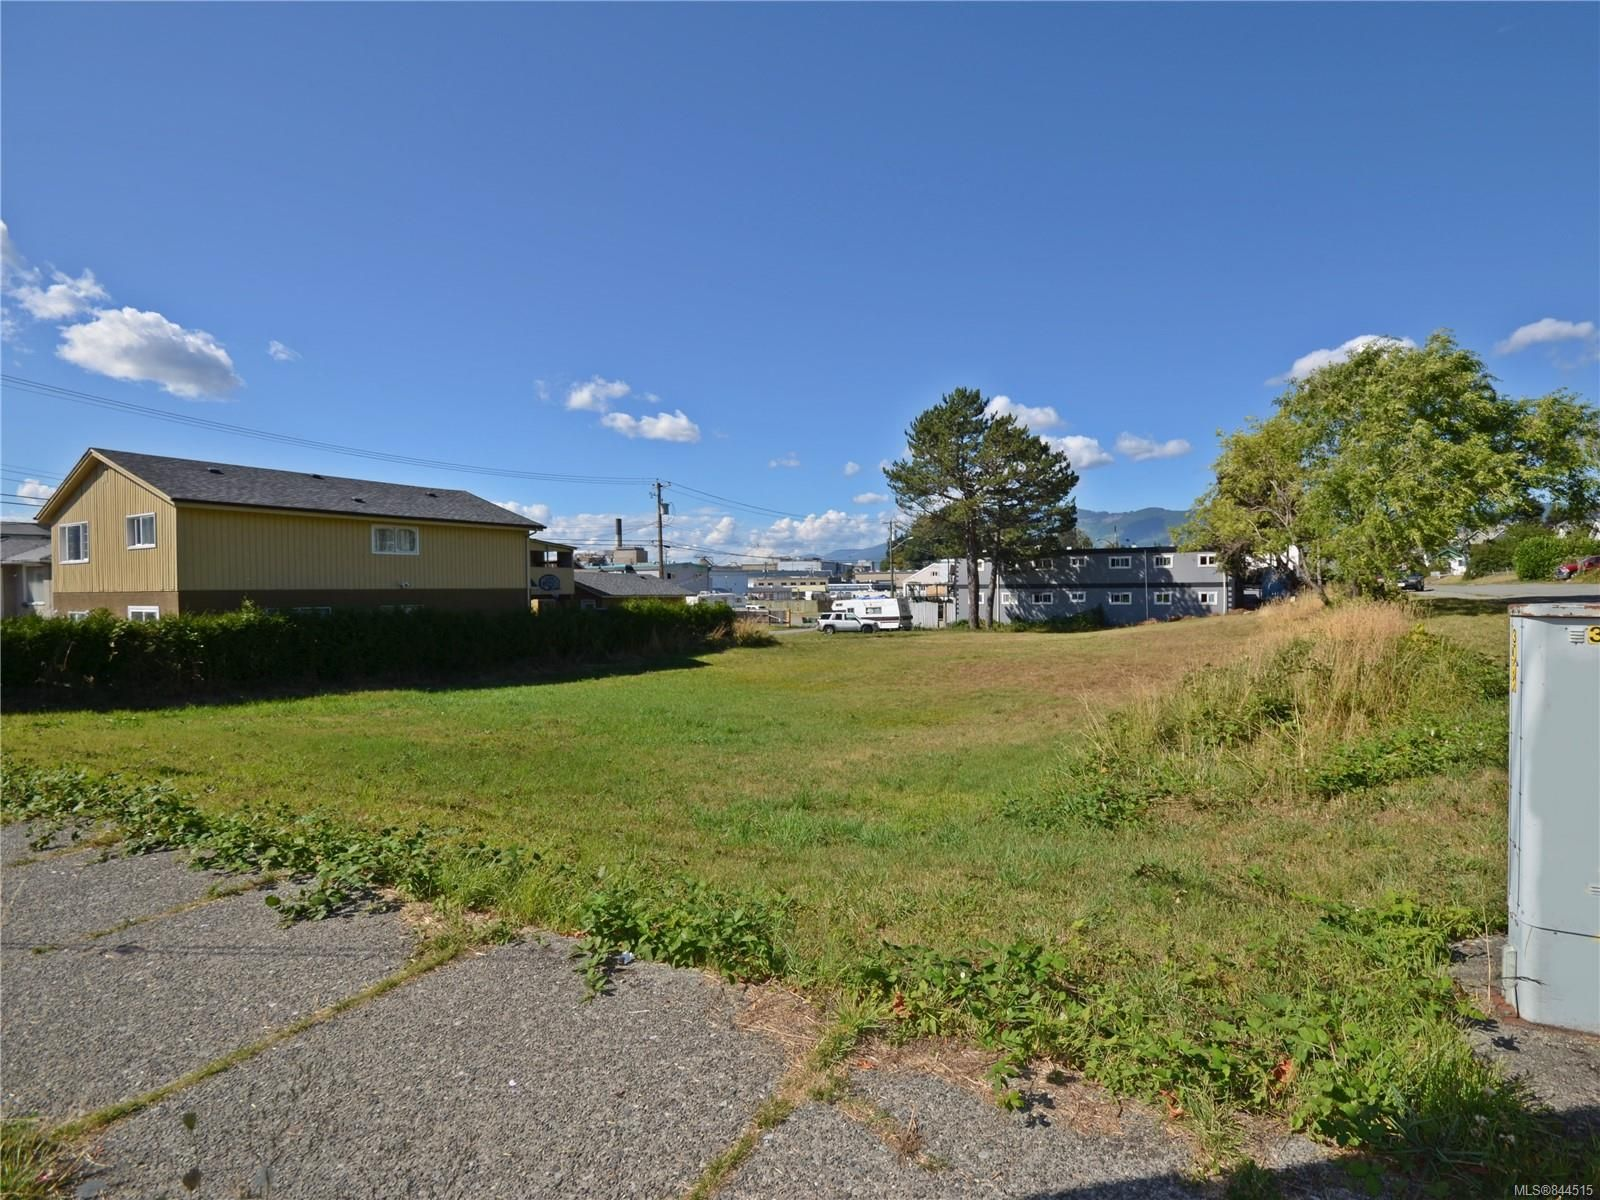 Main Photo: 4825 Burde St in PORT ALBERNI: PA Port Alberni Mixed Use for sale (Port Alberni)  : MLS®# 844515